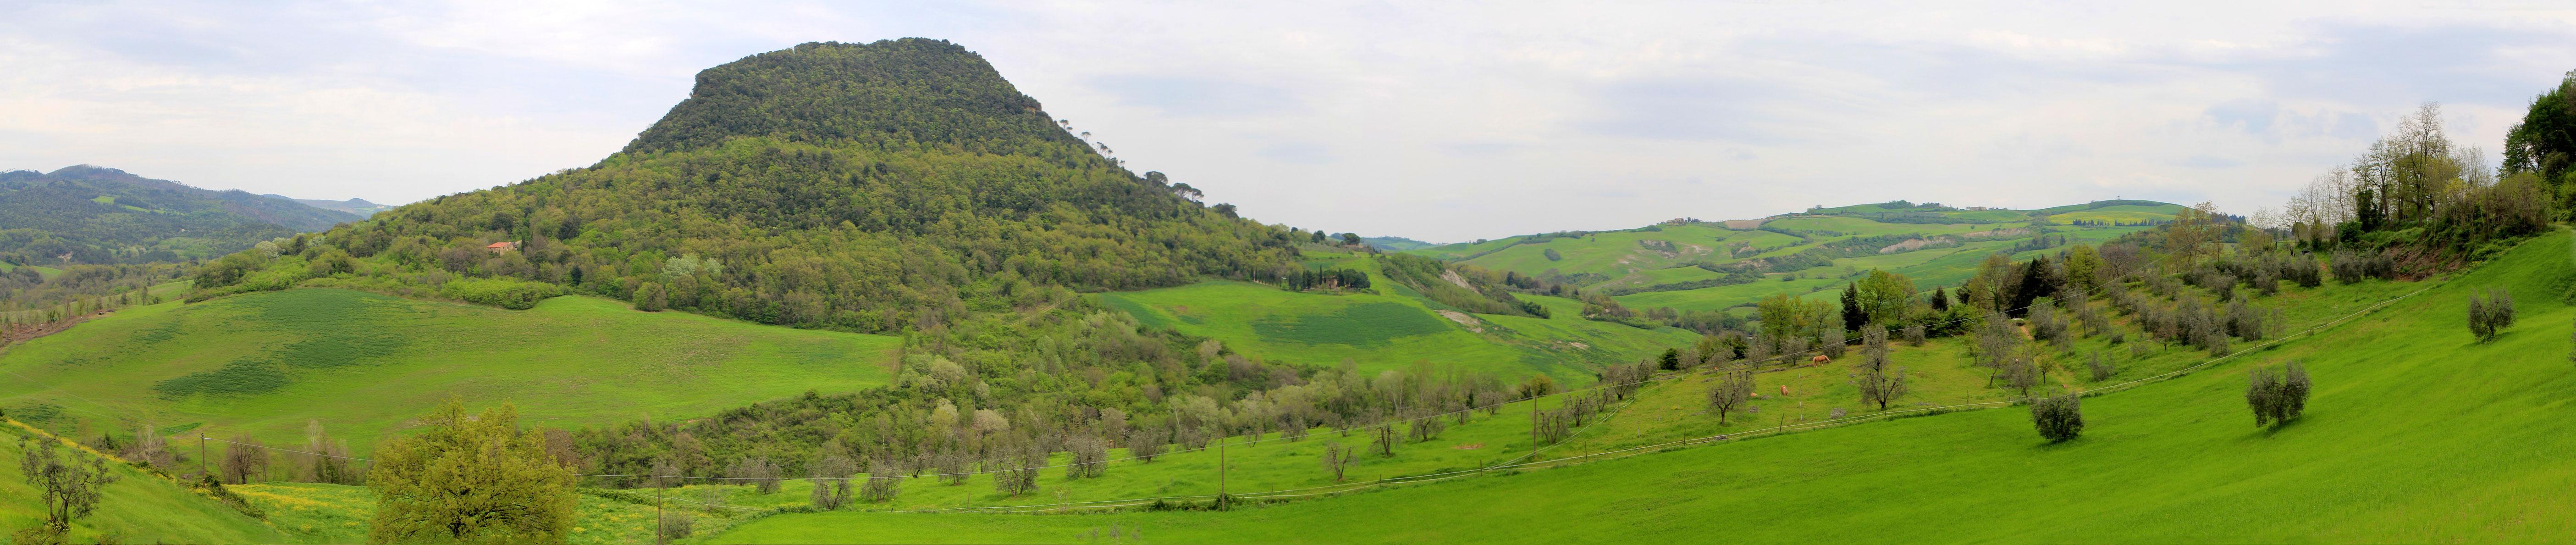 Tuscana (Tuscany) Panoramic Serene Countryside